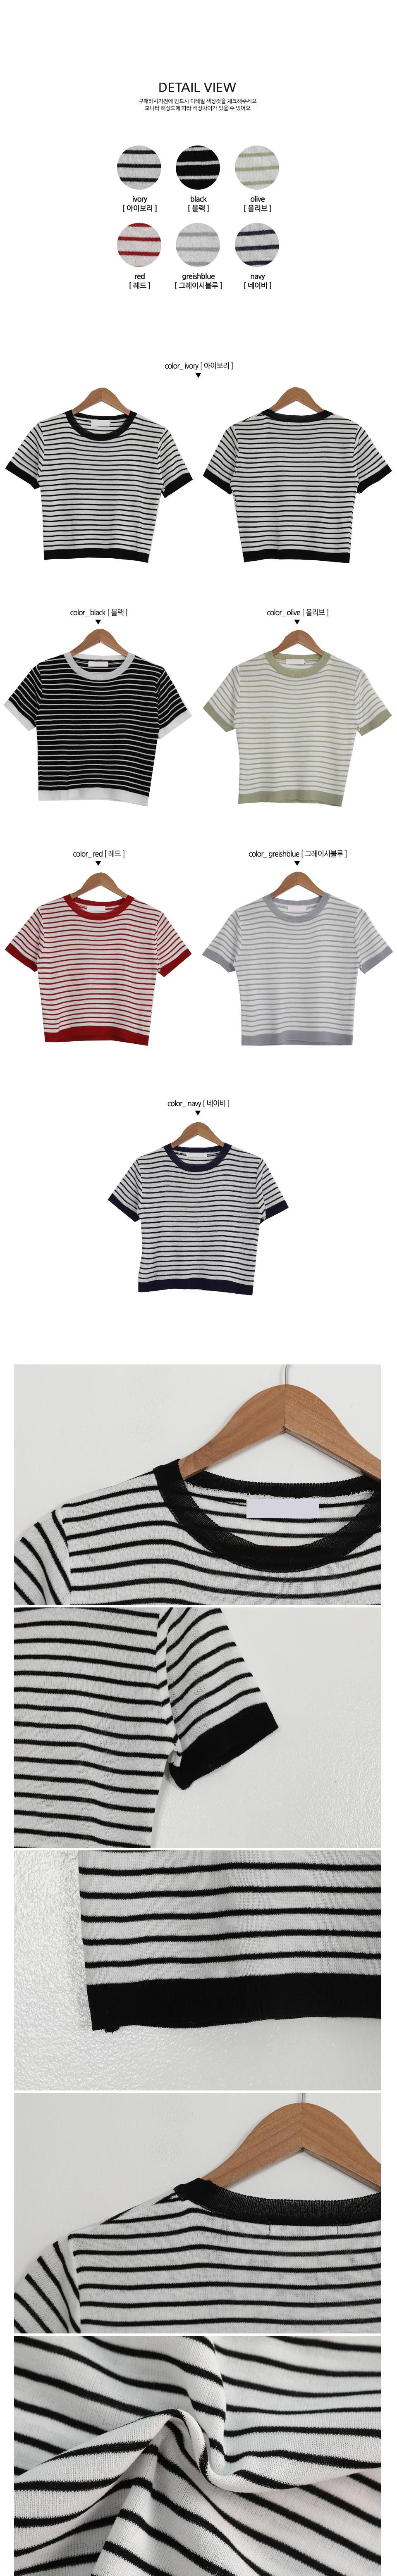 Marine Striped Short Sleeve Knitwear